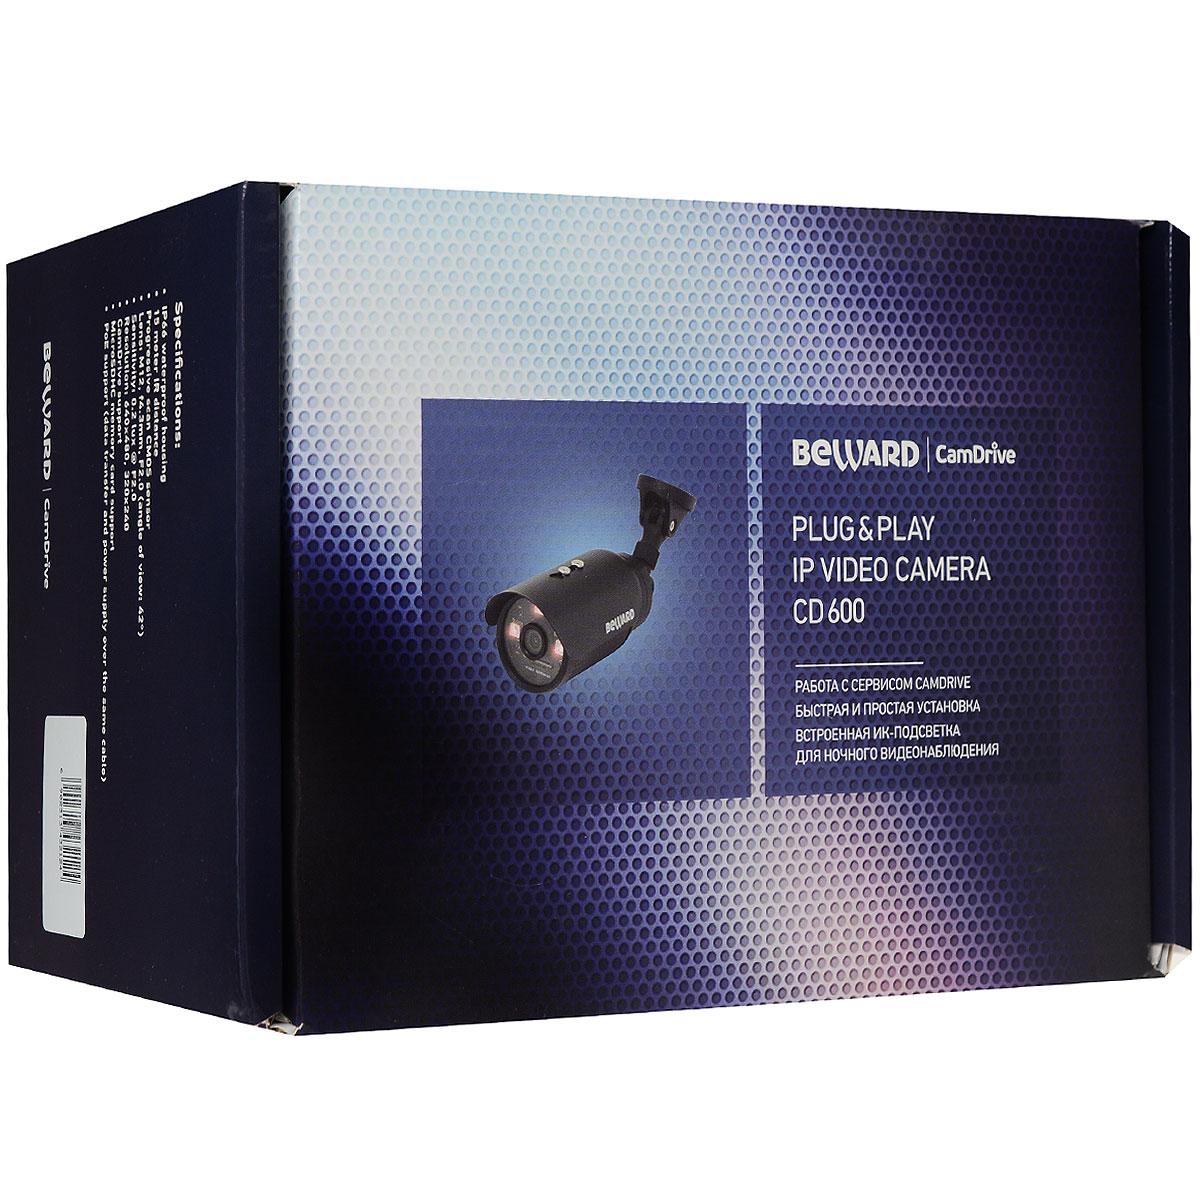 Beward CD600, Black IP-камера ( CD600 )